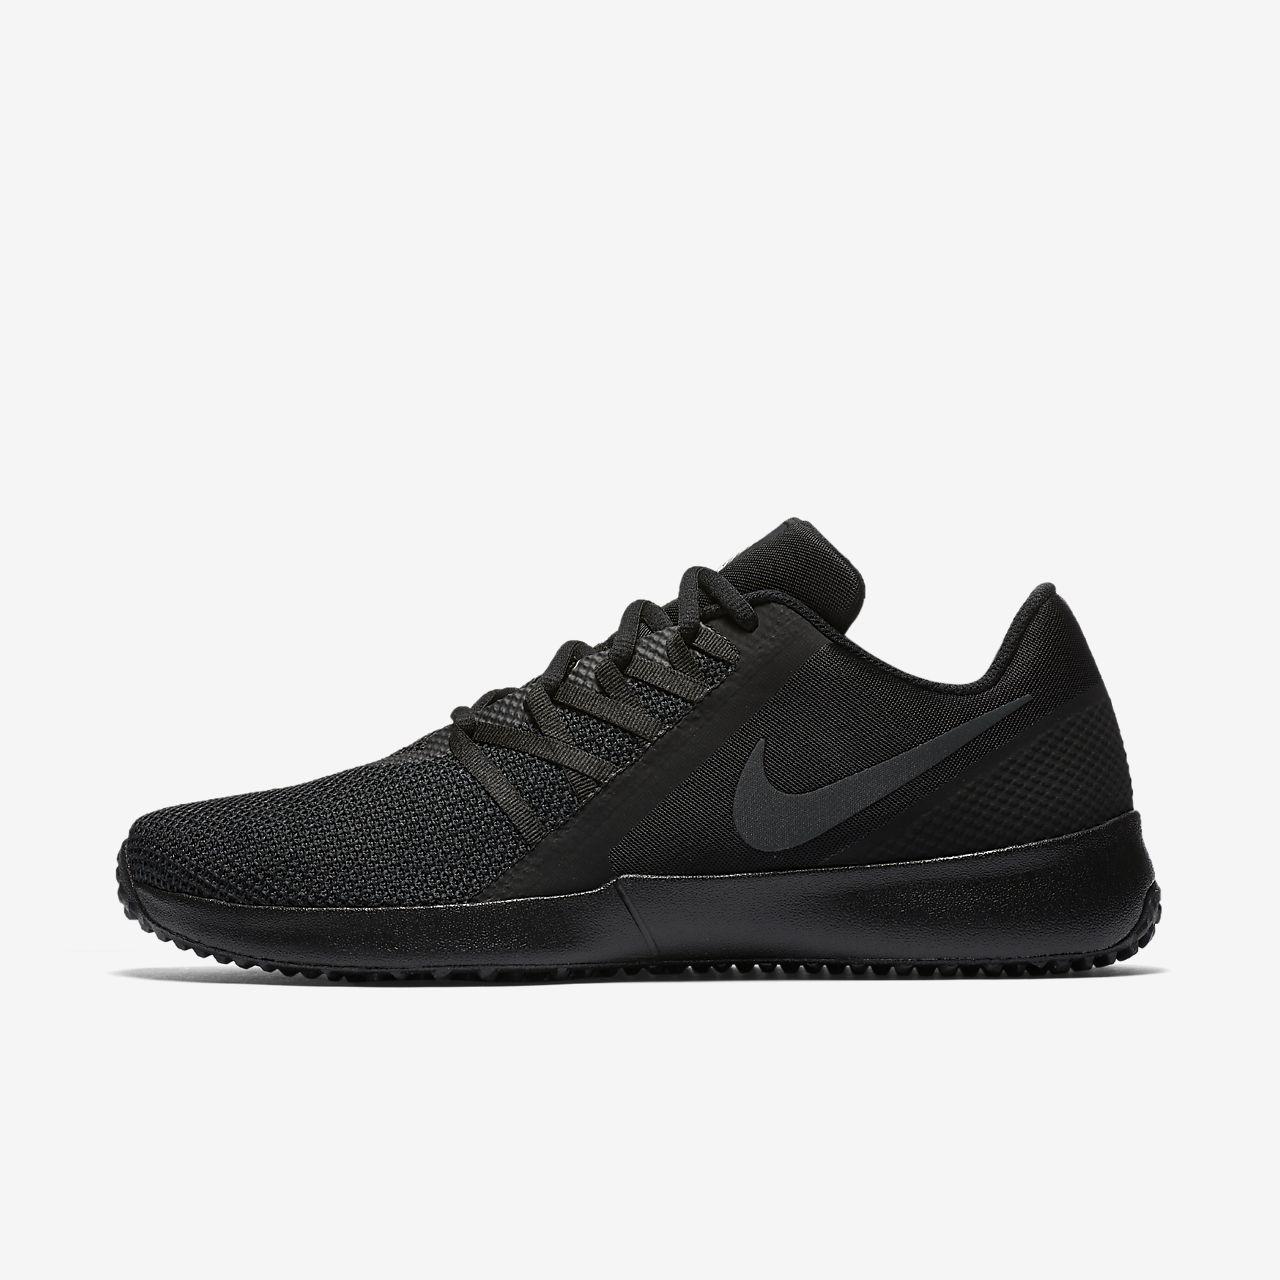 ... Nike Varsity Complete Trainer Men's Training Shoe